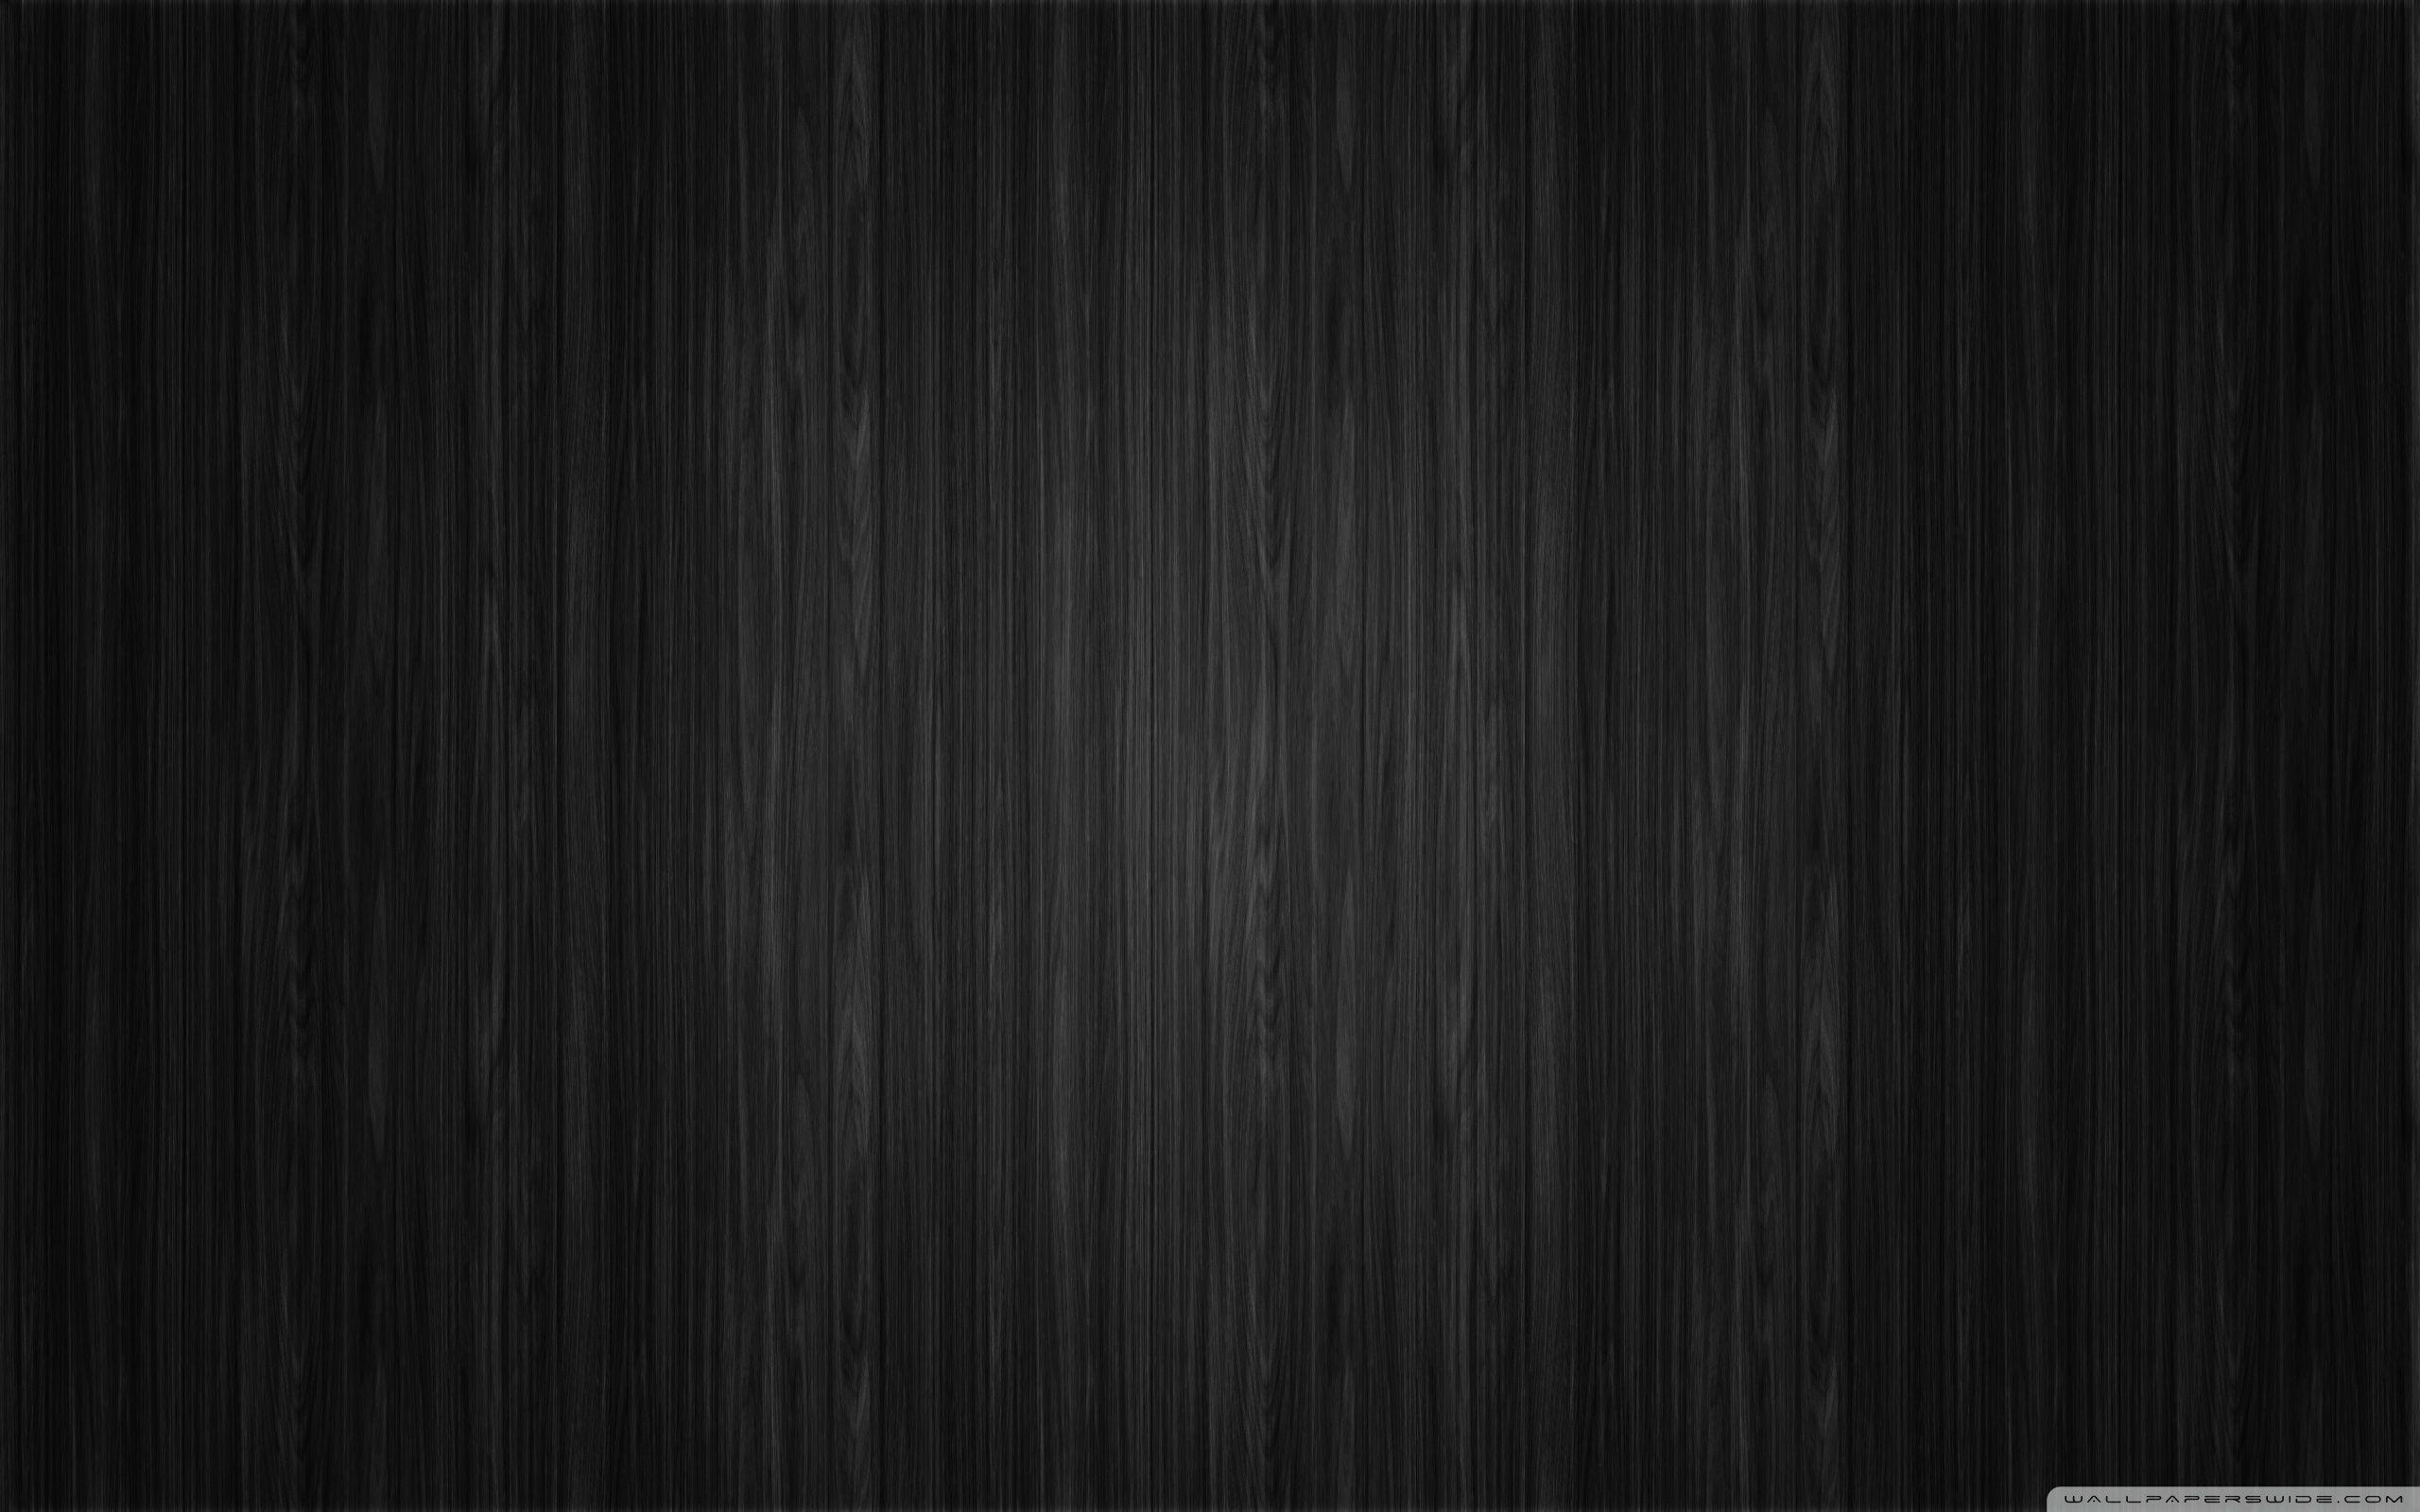 Black Background Wood Clean HD desktop wallpaper : Widescreen ...